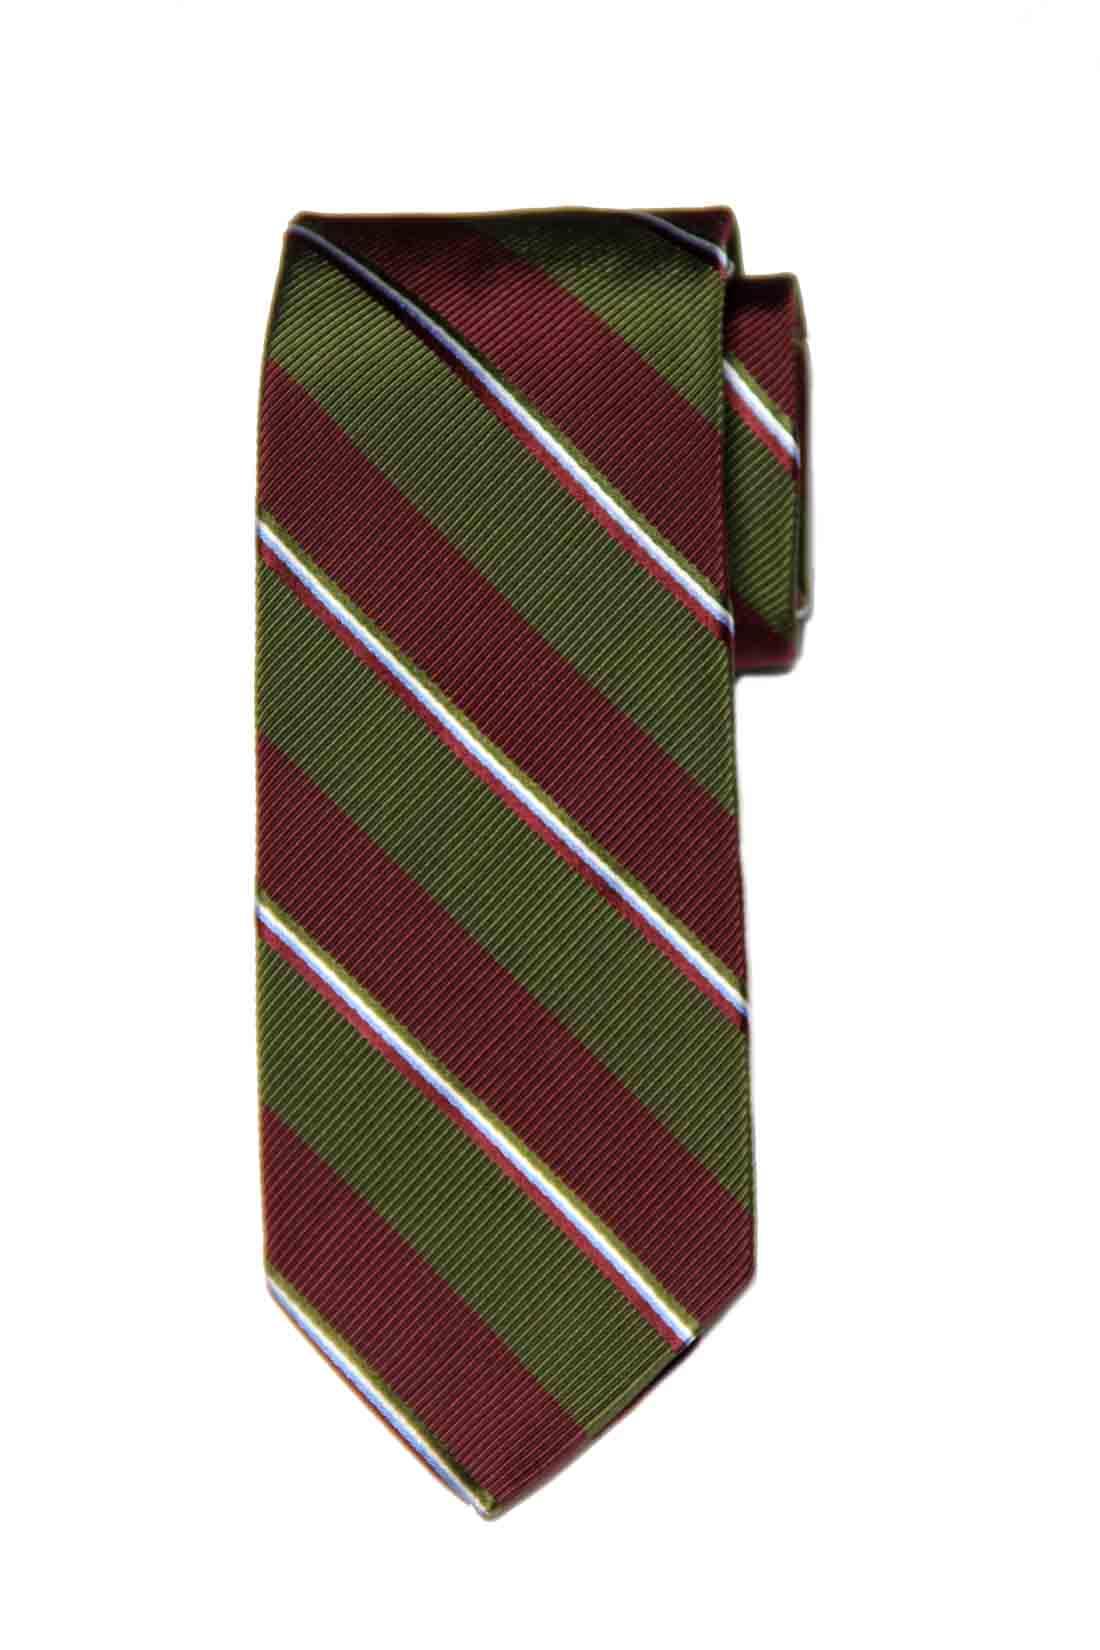 Brooks Brothers Silk Tie Green Burgundy Blue White Striped Men's